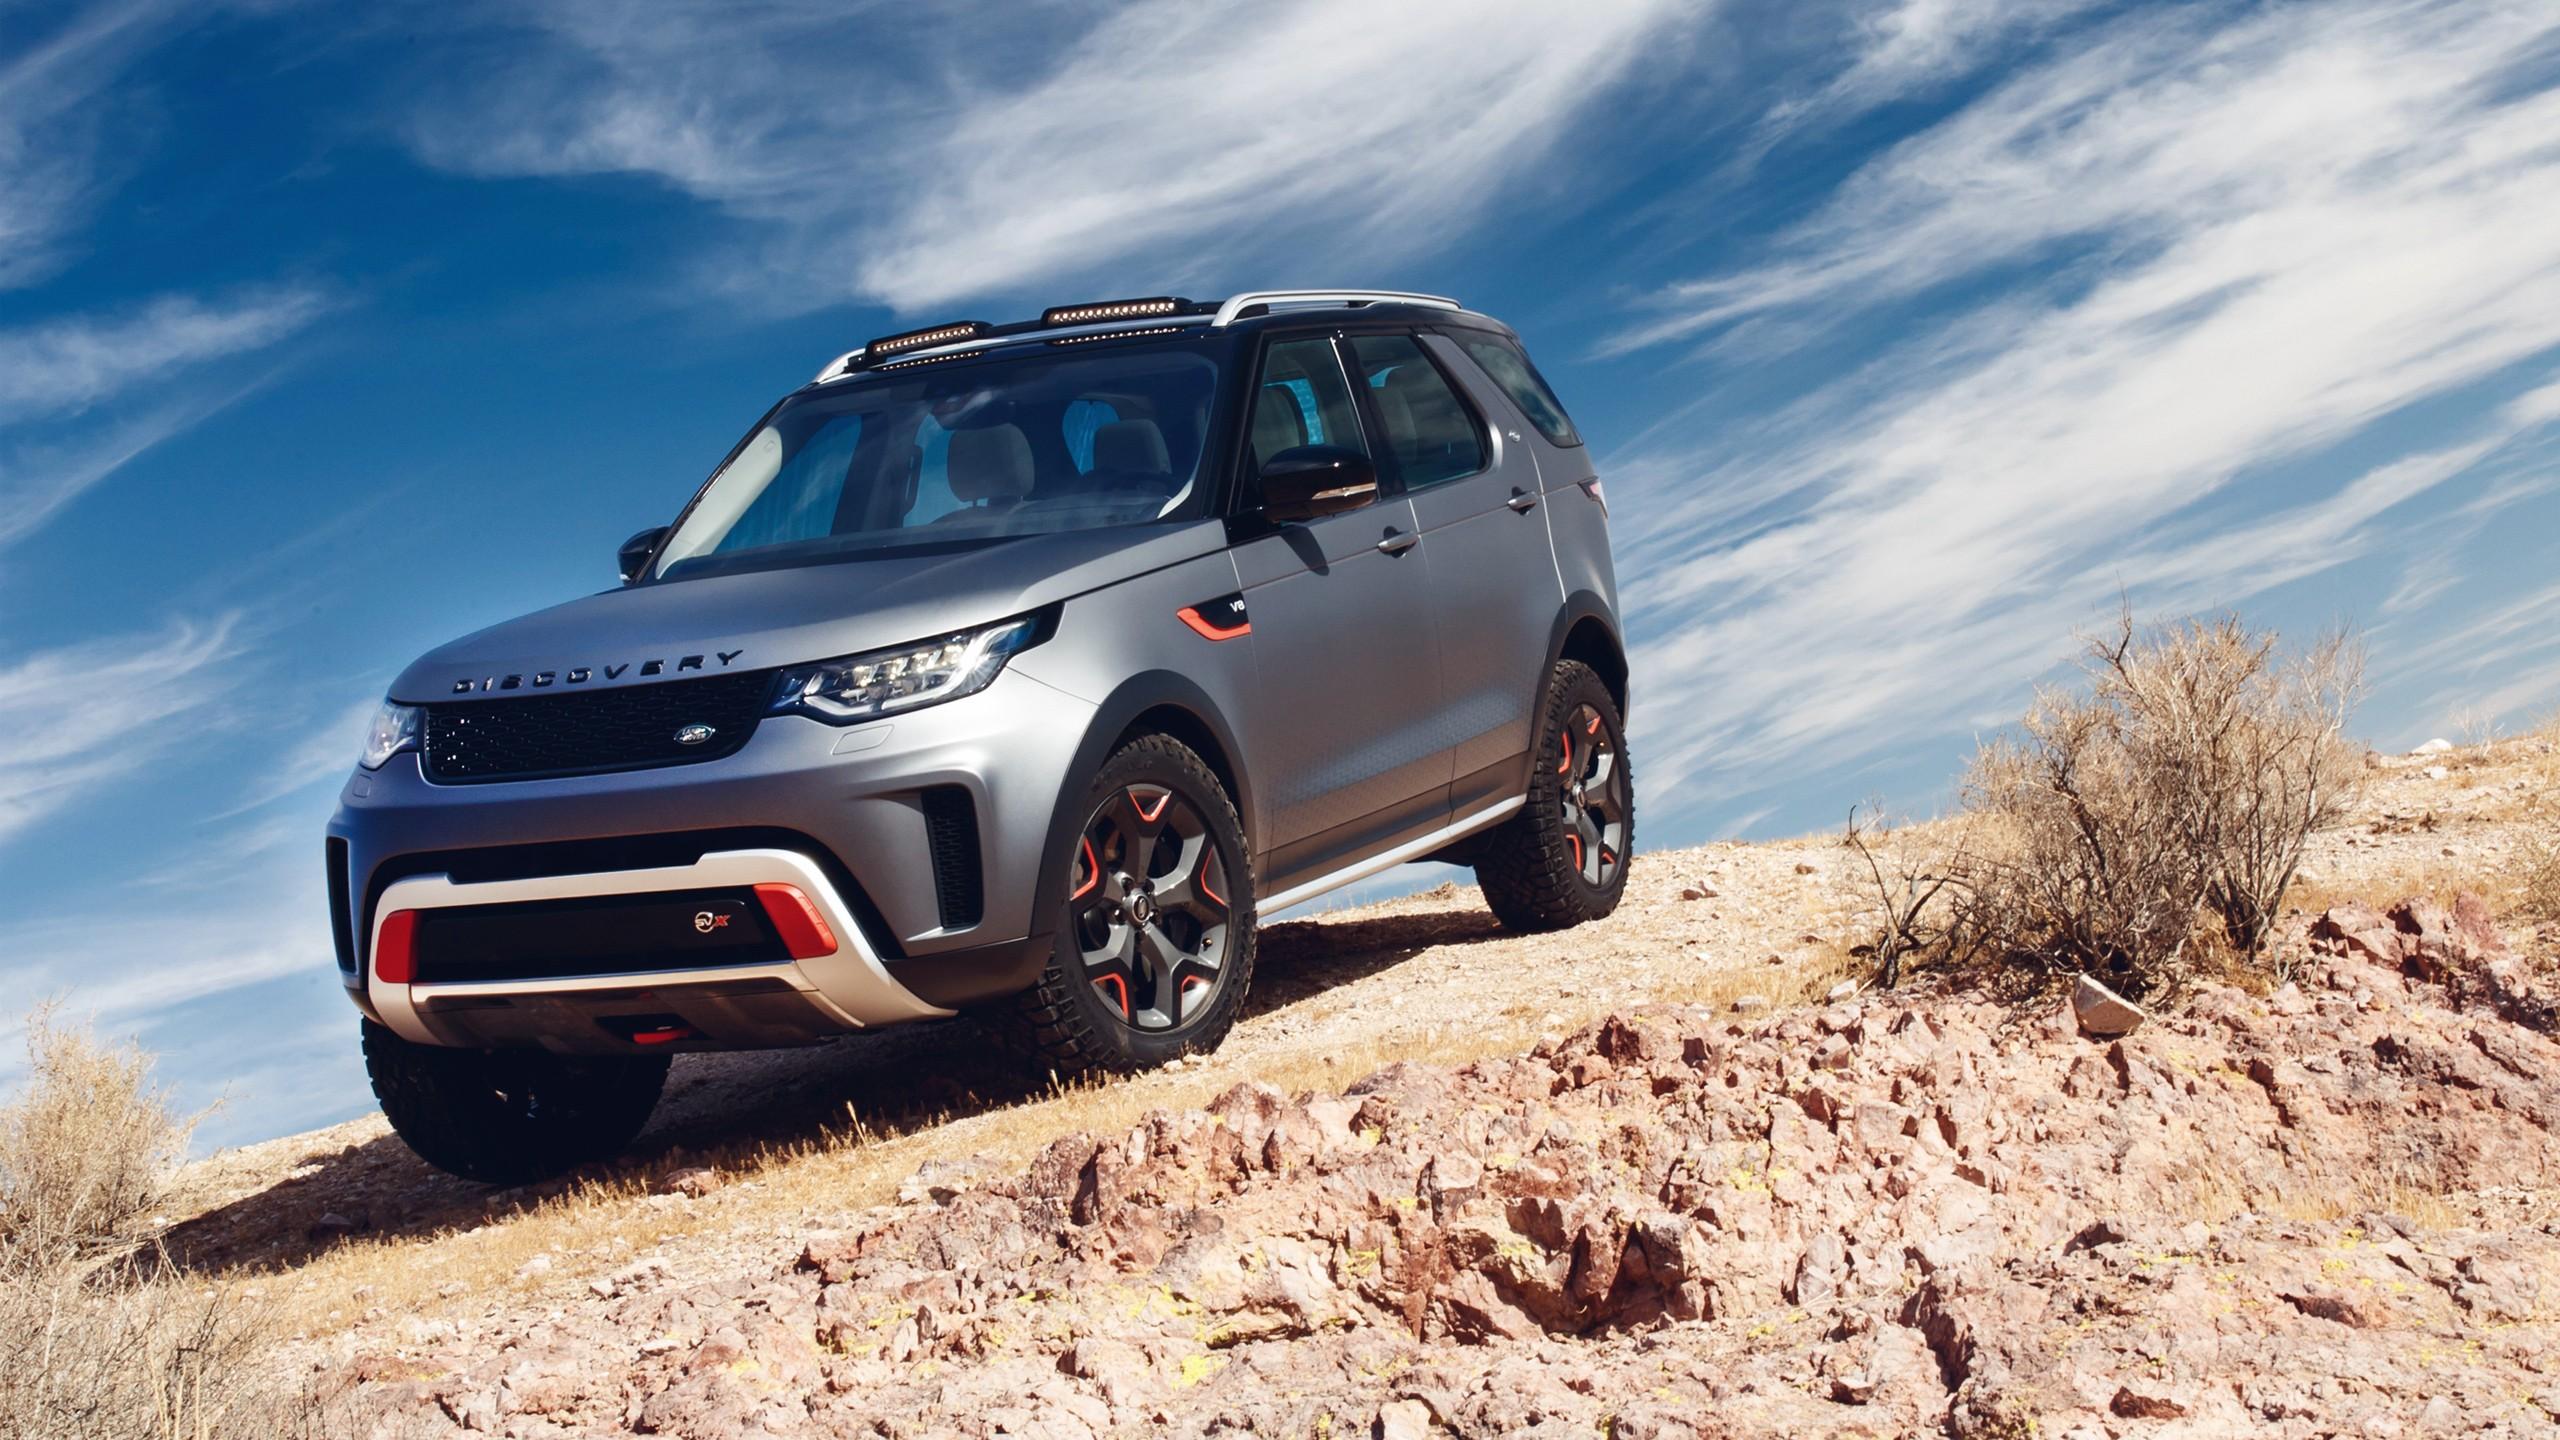 Range Rover Car Hd Wallpaper Download 2018 Land Rover Discovery Svx 2 Wallpaper Hd Car